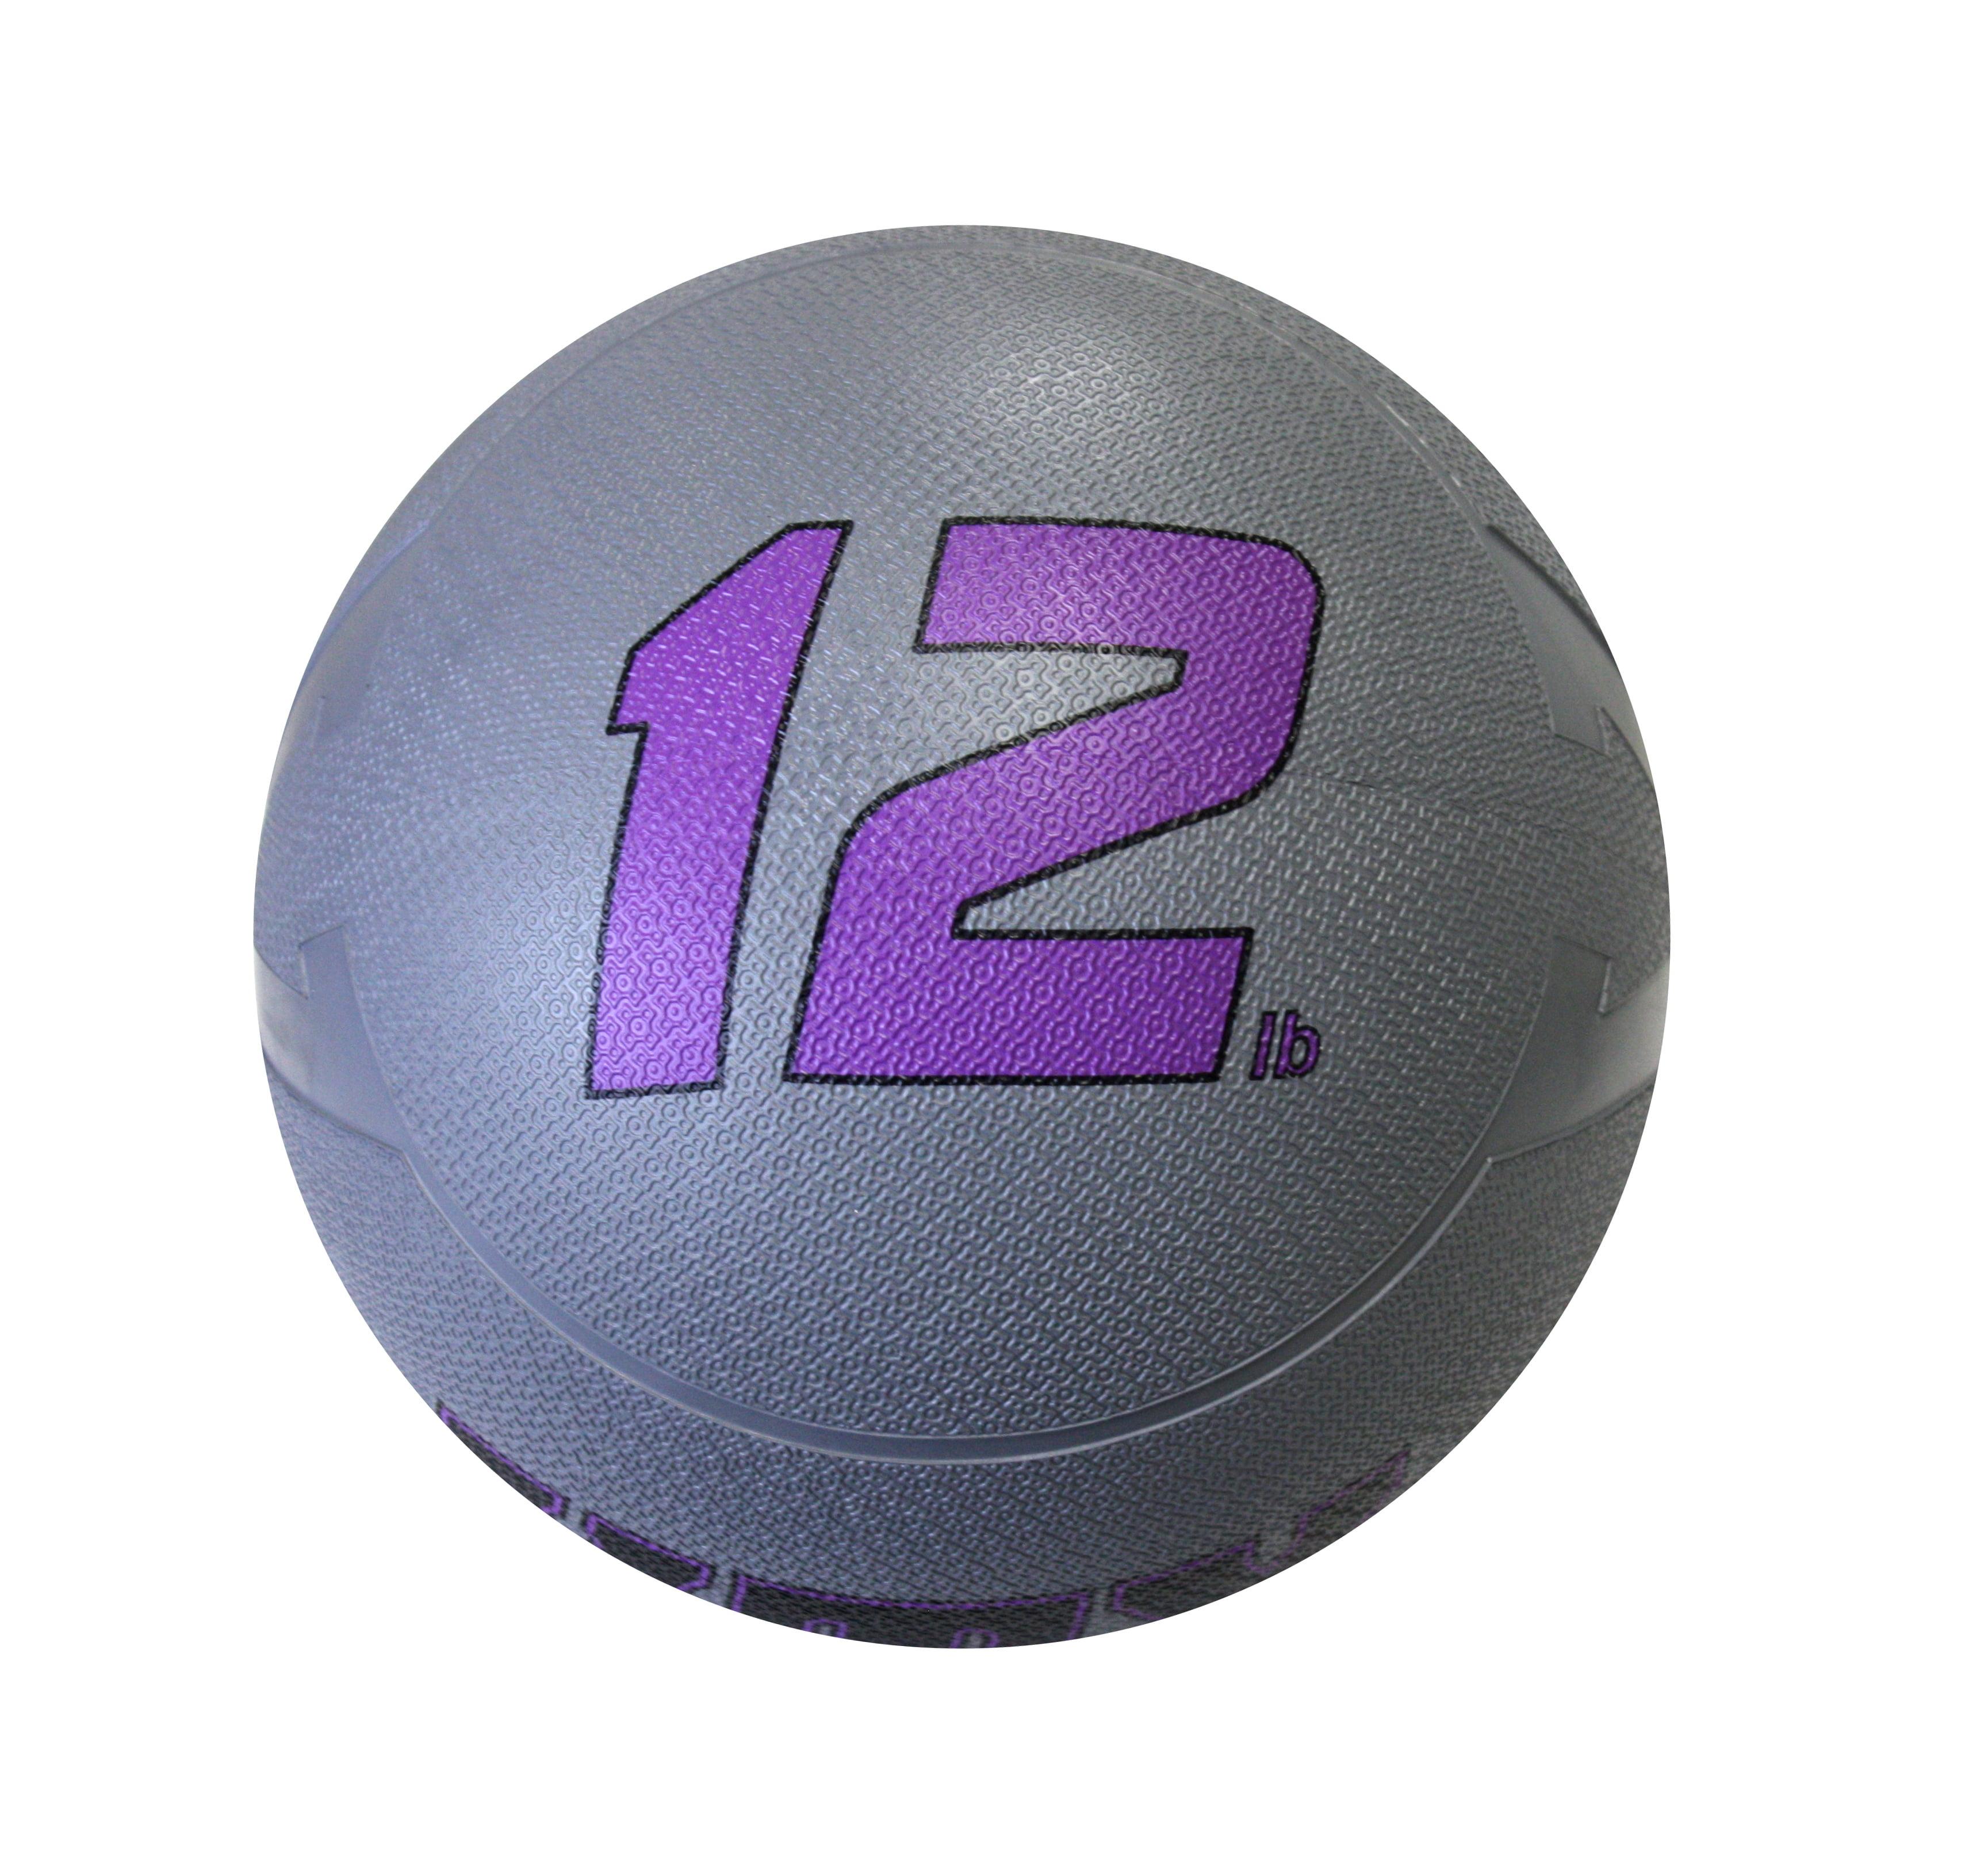 Troy VTX Functional Medicine Ball - 12 lbs